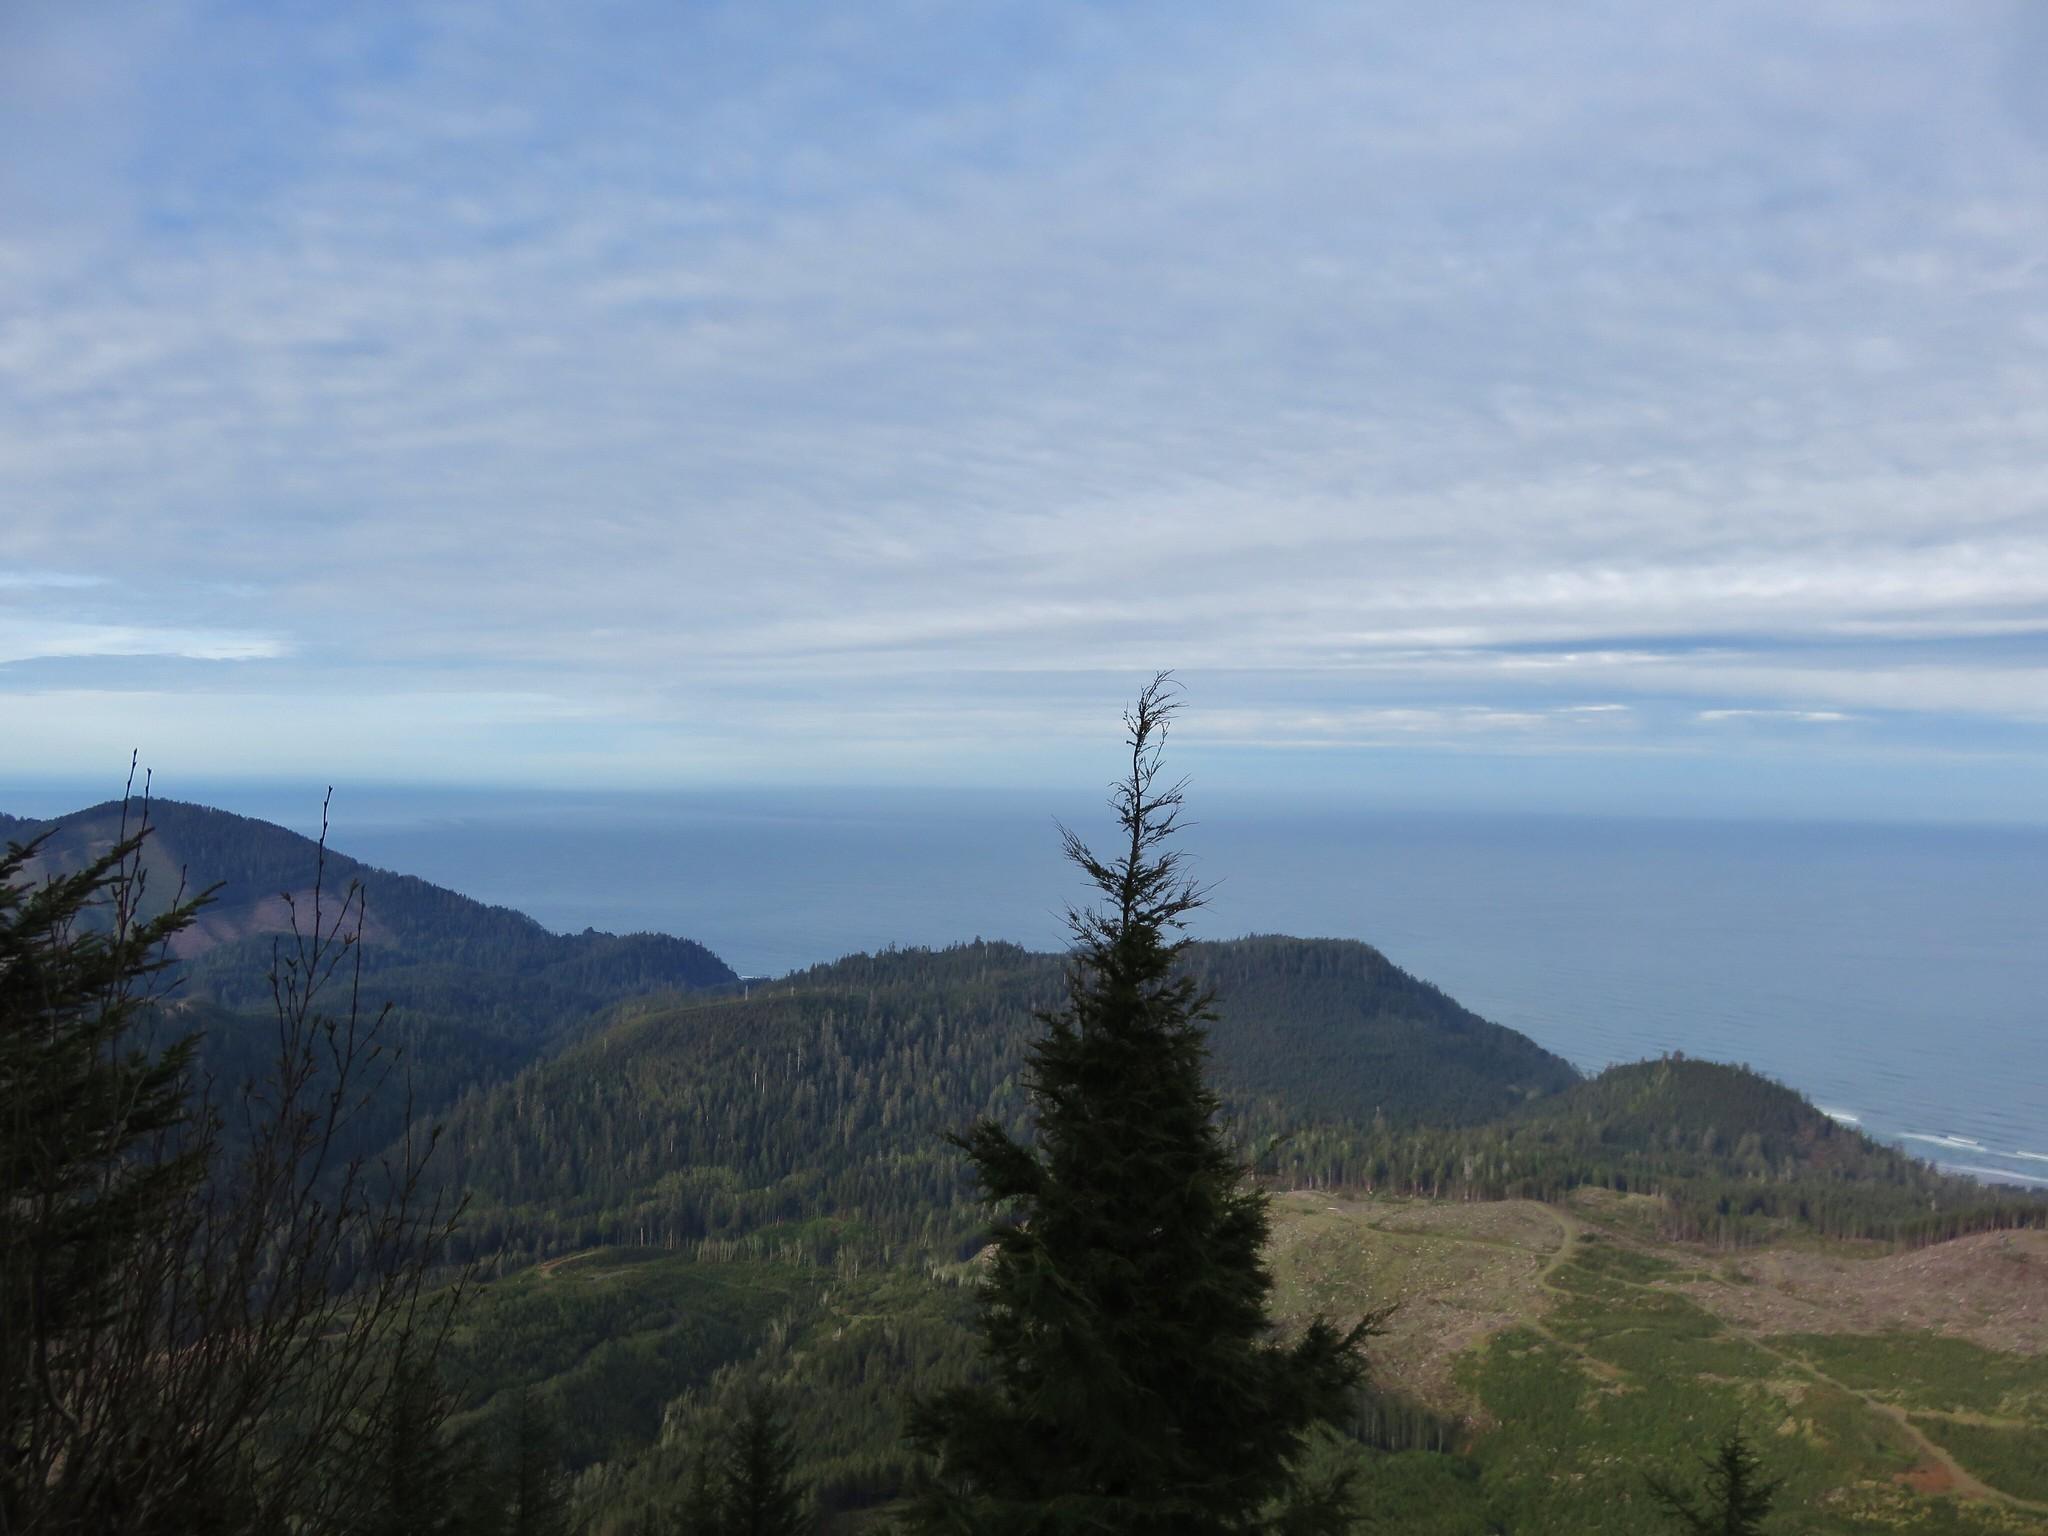 Neahkahnie Mountain and Cape Falcon